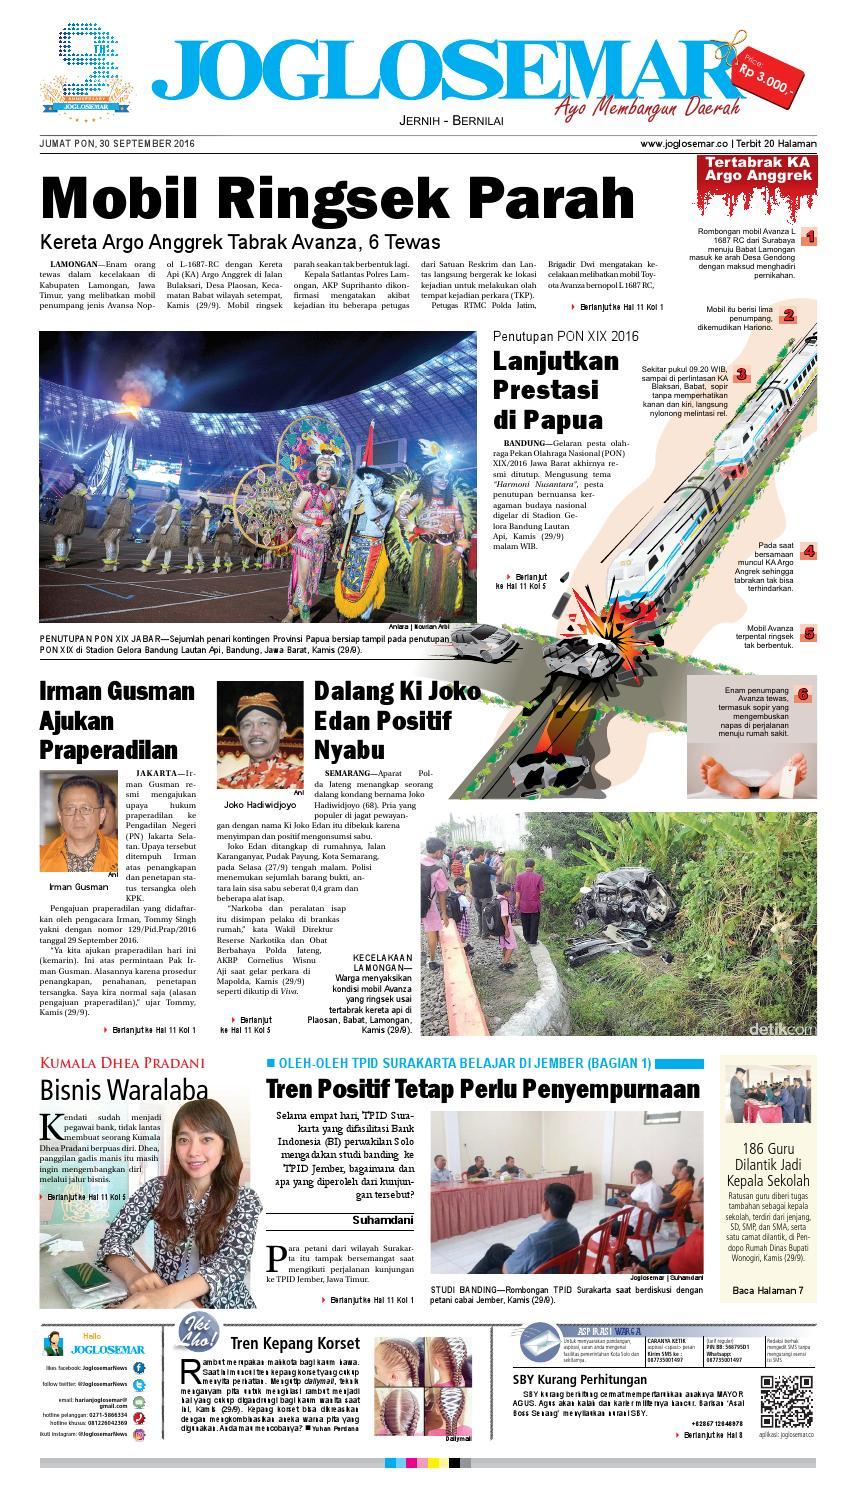 E Paper 30 September 2016 By Pt Joglosemar Prima Media Issuu Kartu Kemat Listrik